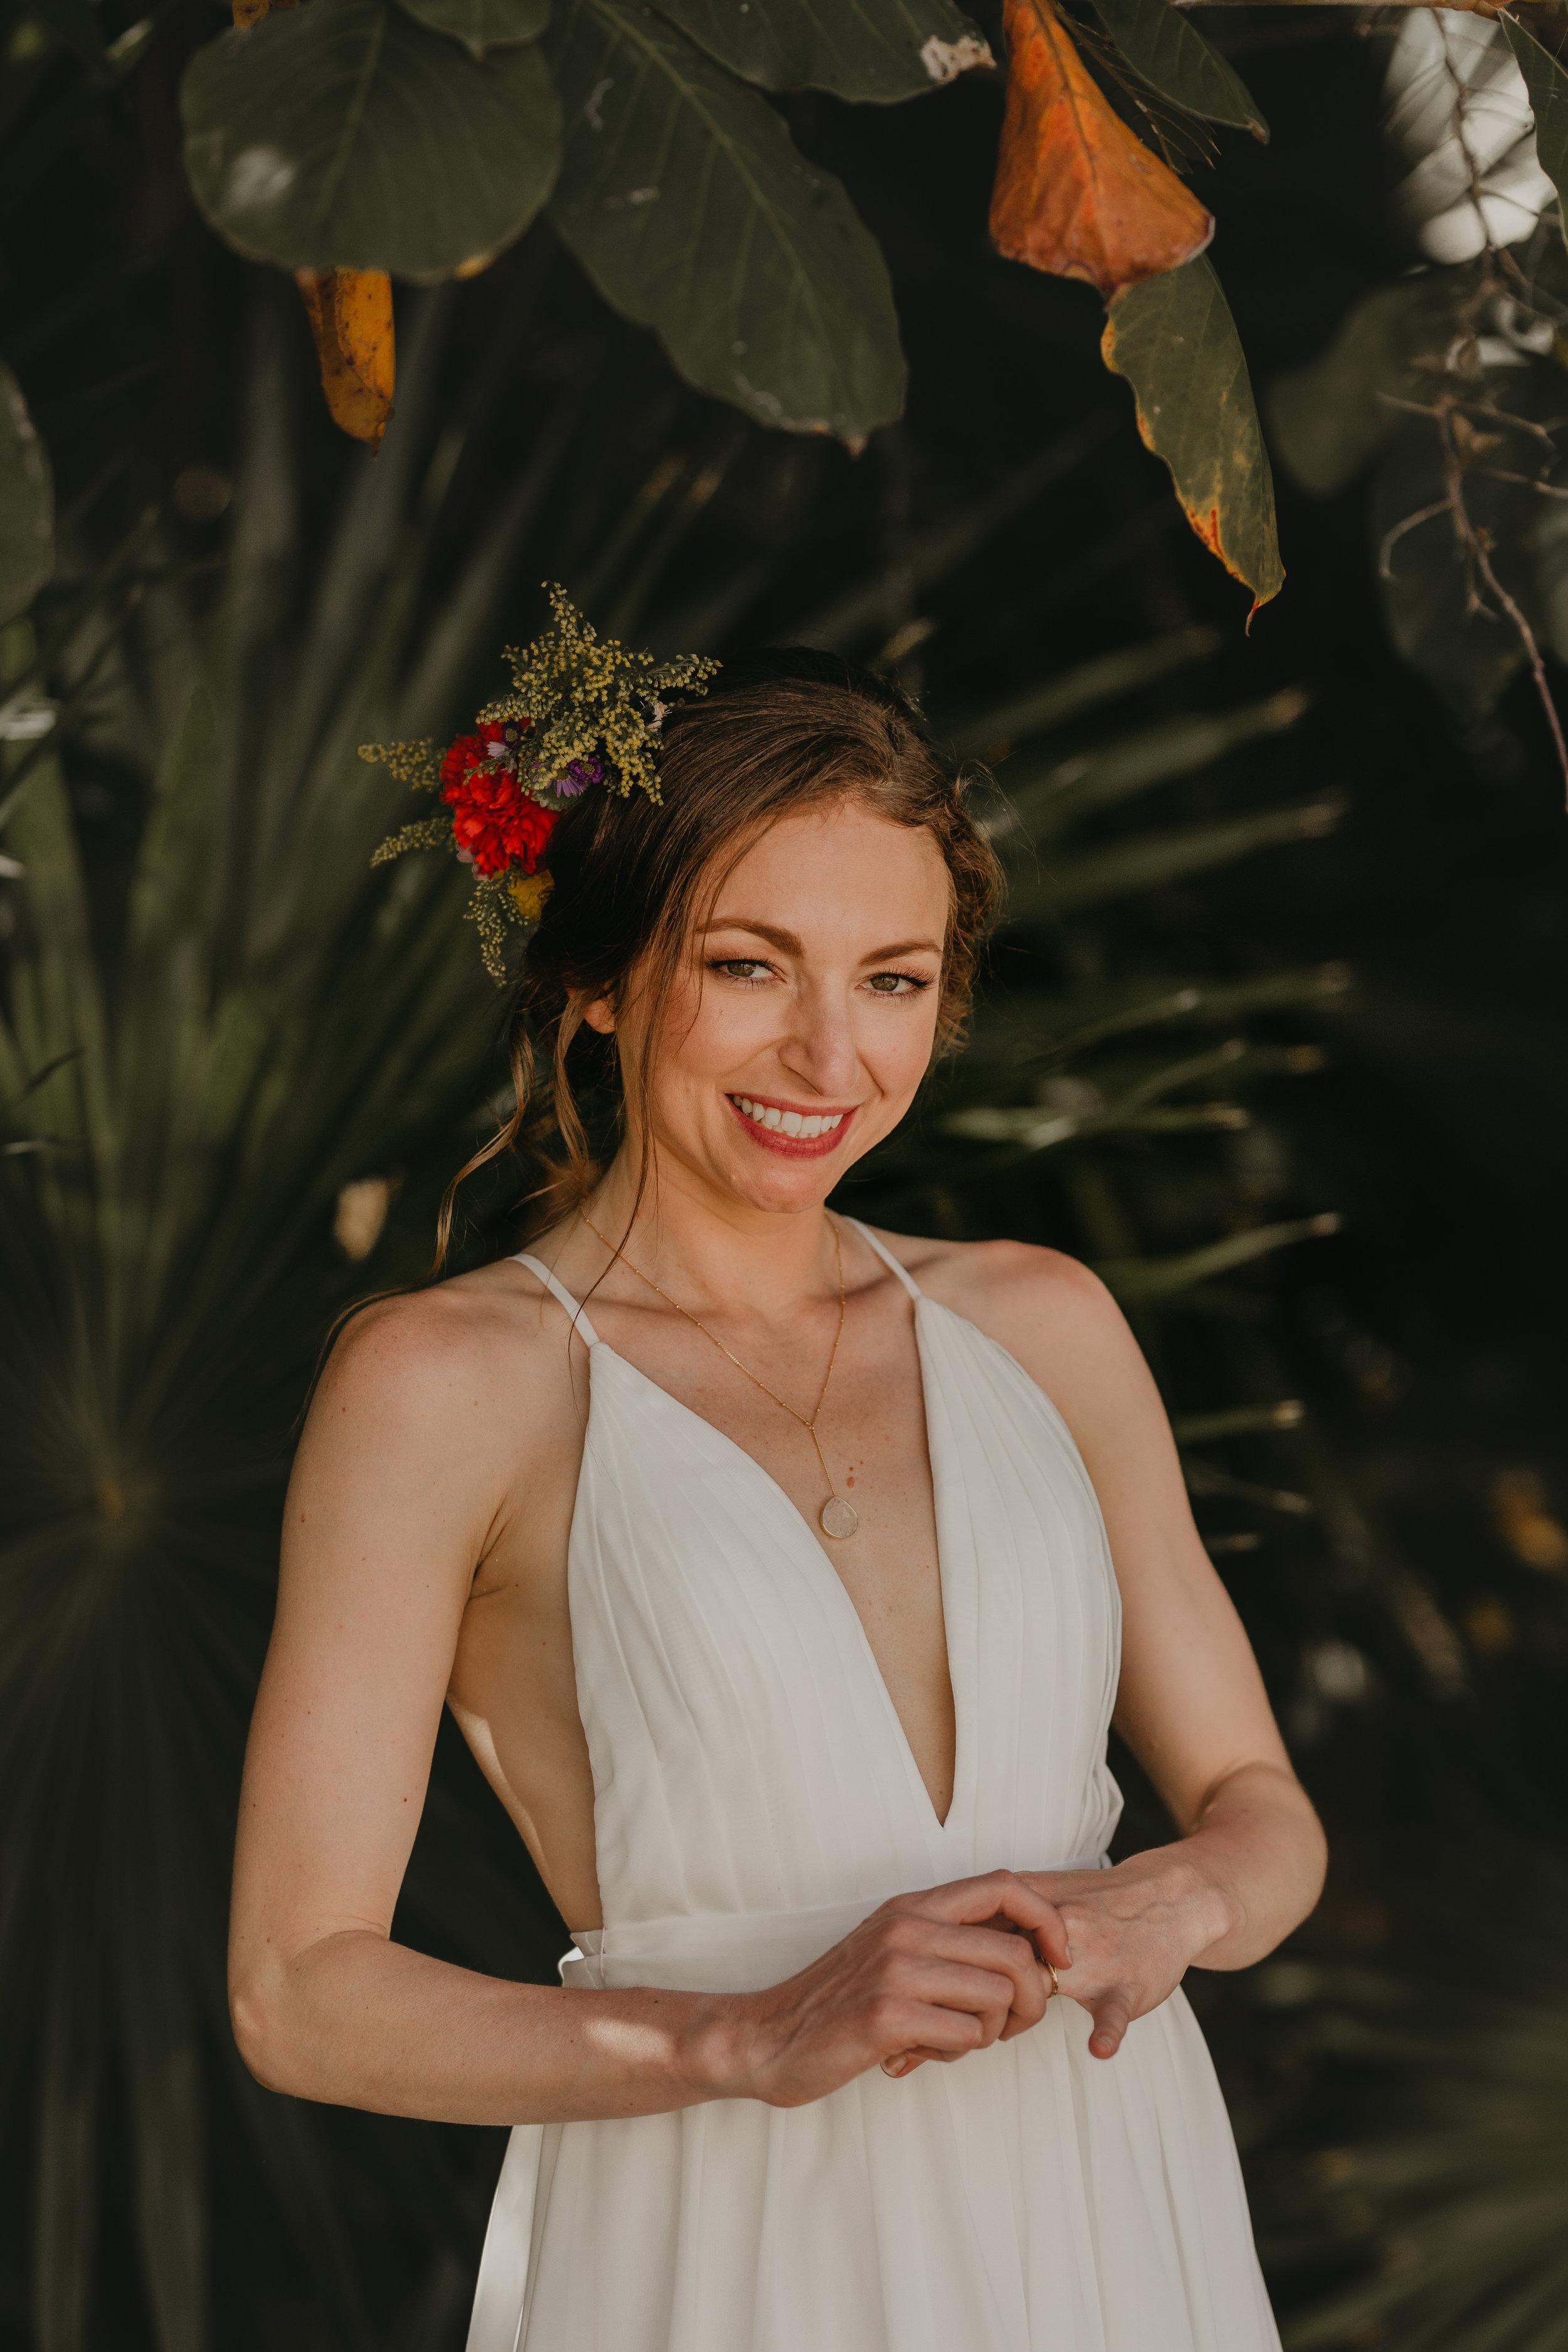 Nicole-Daacke-Photography-beachfront-akumal-destionation-wedding-tulum-mexico-elopement-photographer-destination-wedding-inspiration-sunset-champagne-pop-boho-bride-ocean-tropical-bohemian-tulum-wedding-photos-118.jpg